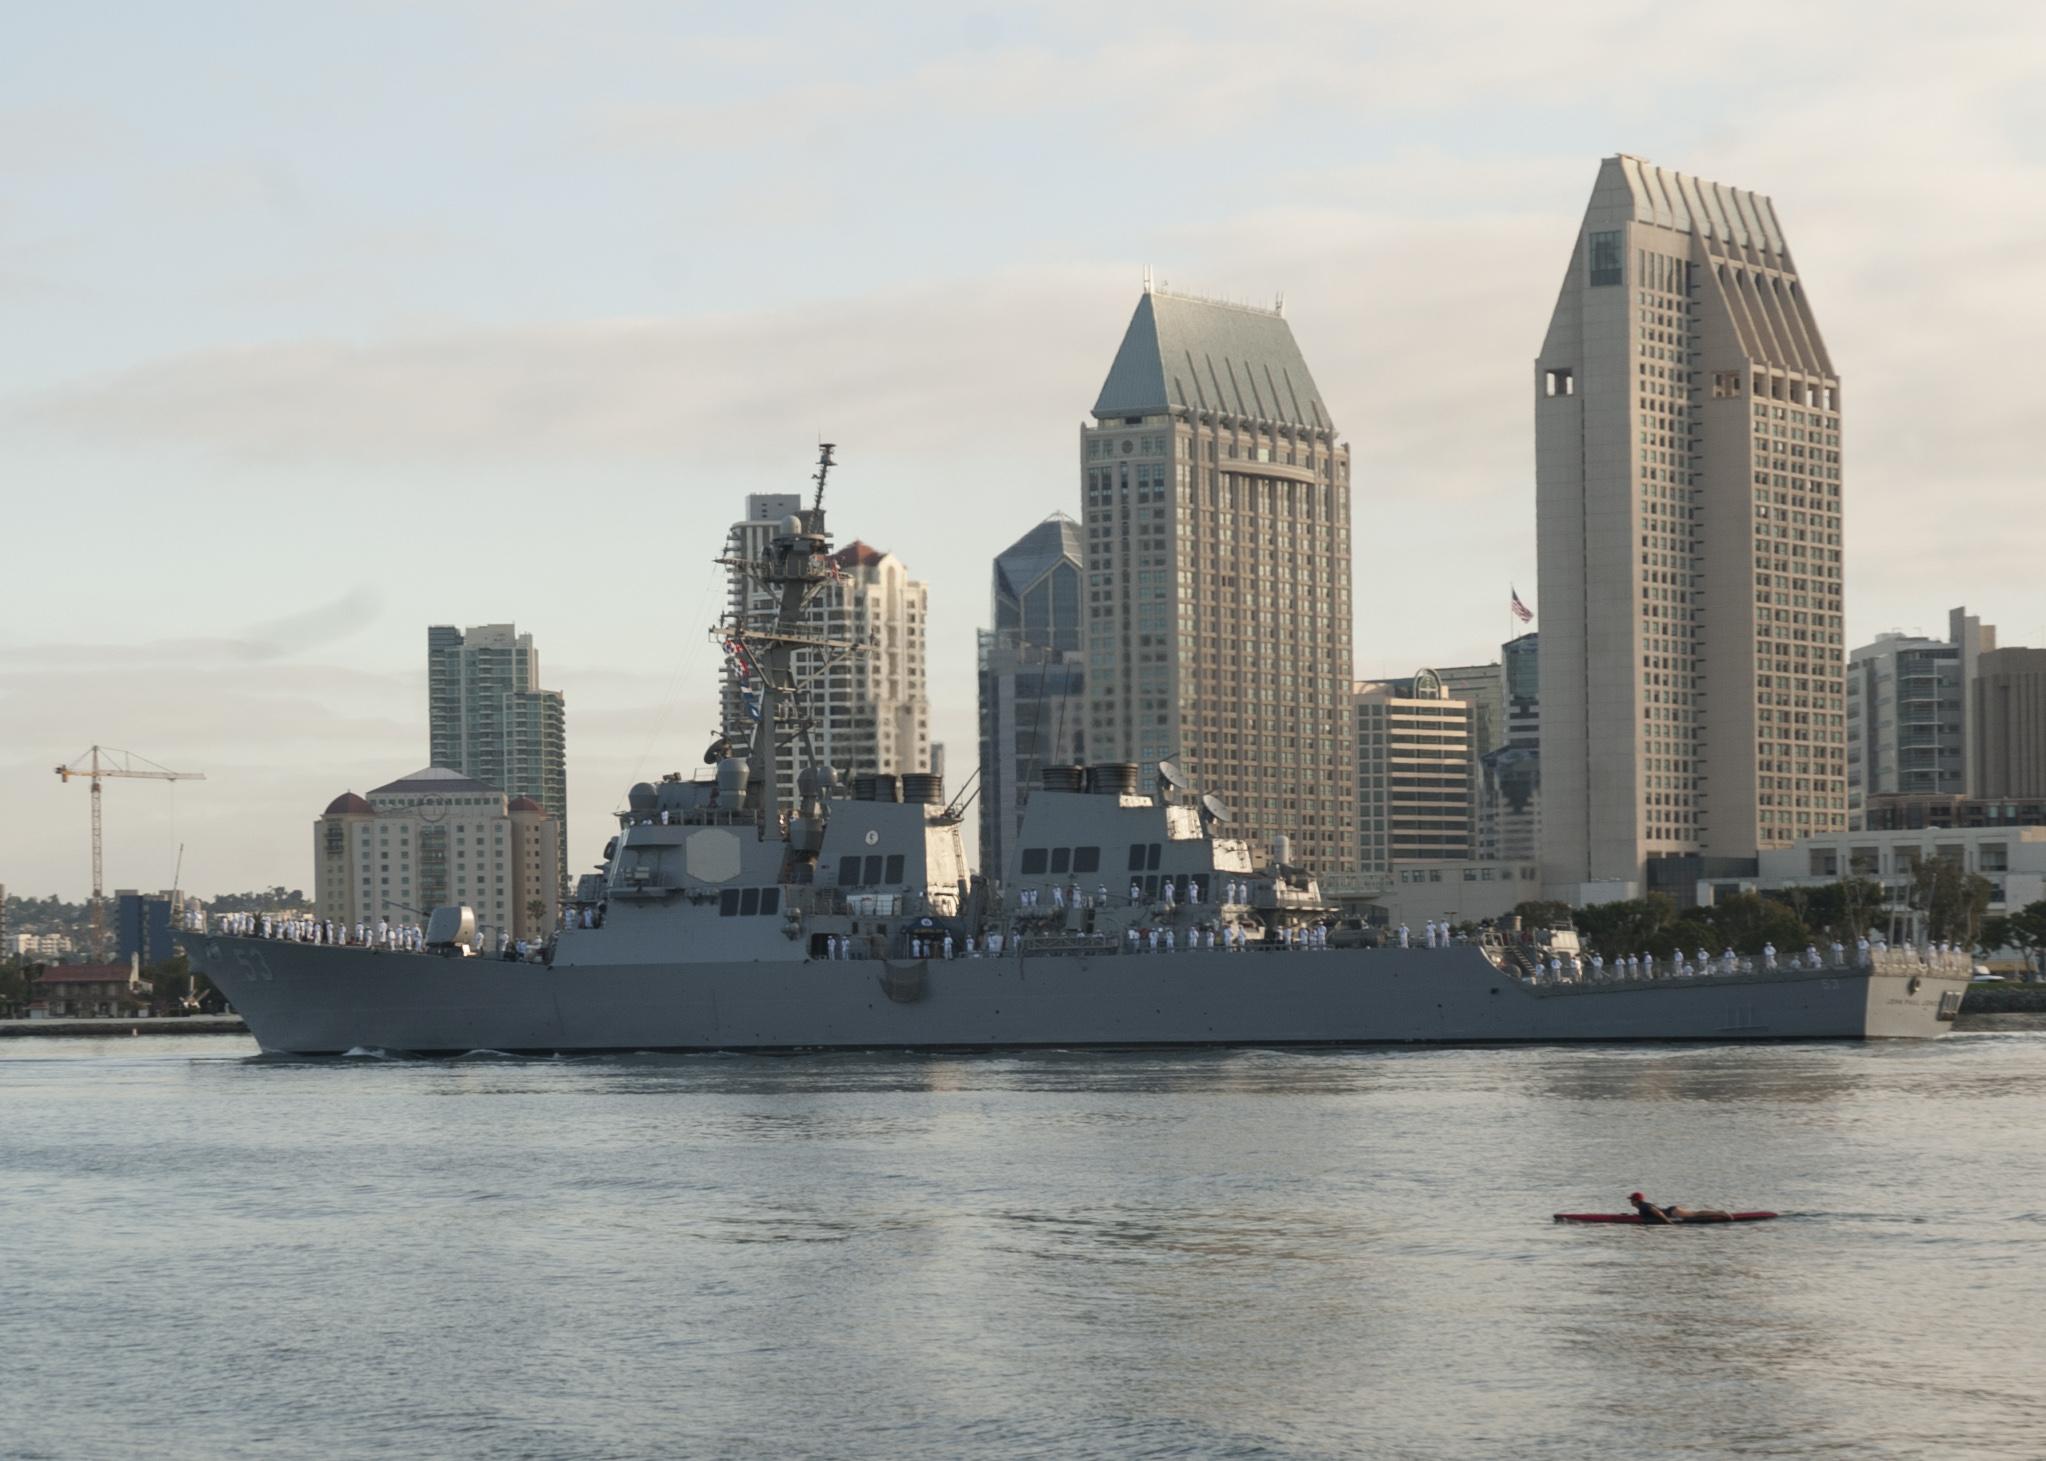 USS JOHN PAUL JONES DDG-53 Auslaufen San Diego 06.08.2014 Bild: U.S. Navy